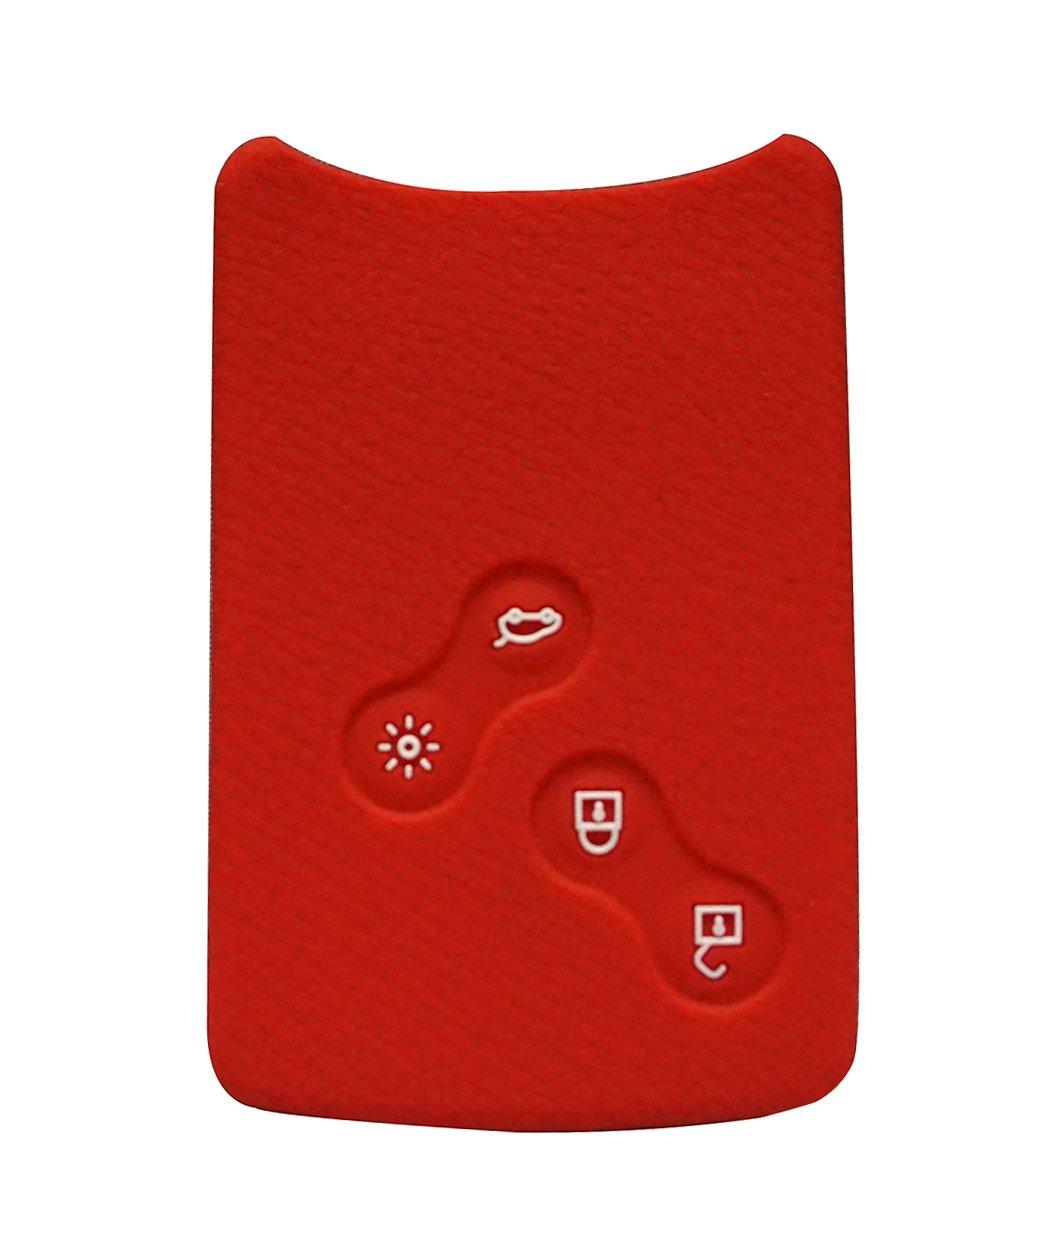 Happyit 4 Buttons Silicone Car Smart Key Cover Case for Renault Clio Scenic Megane Duster Sandero Captur Twingo koleos Remote Control (Black)